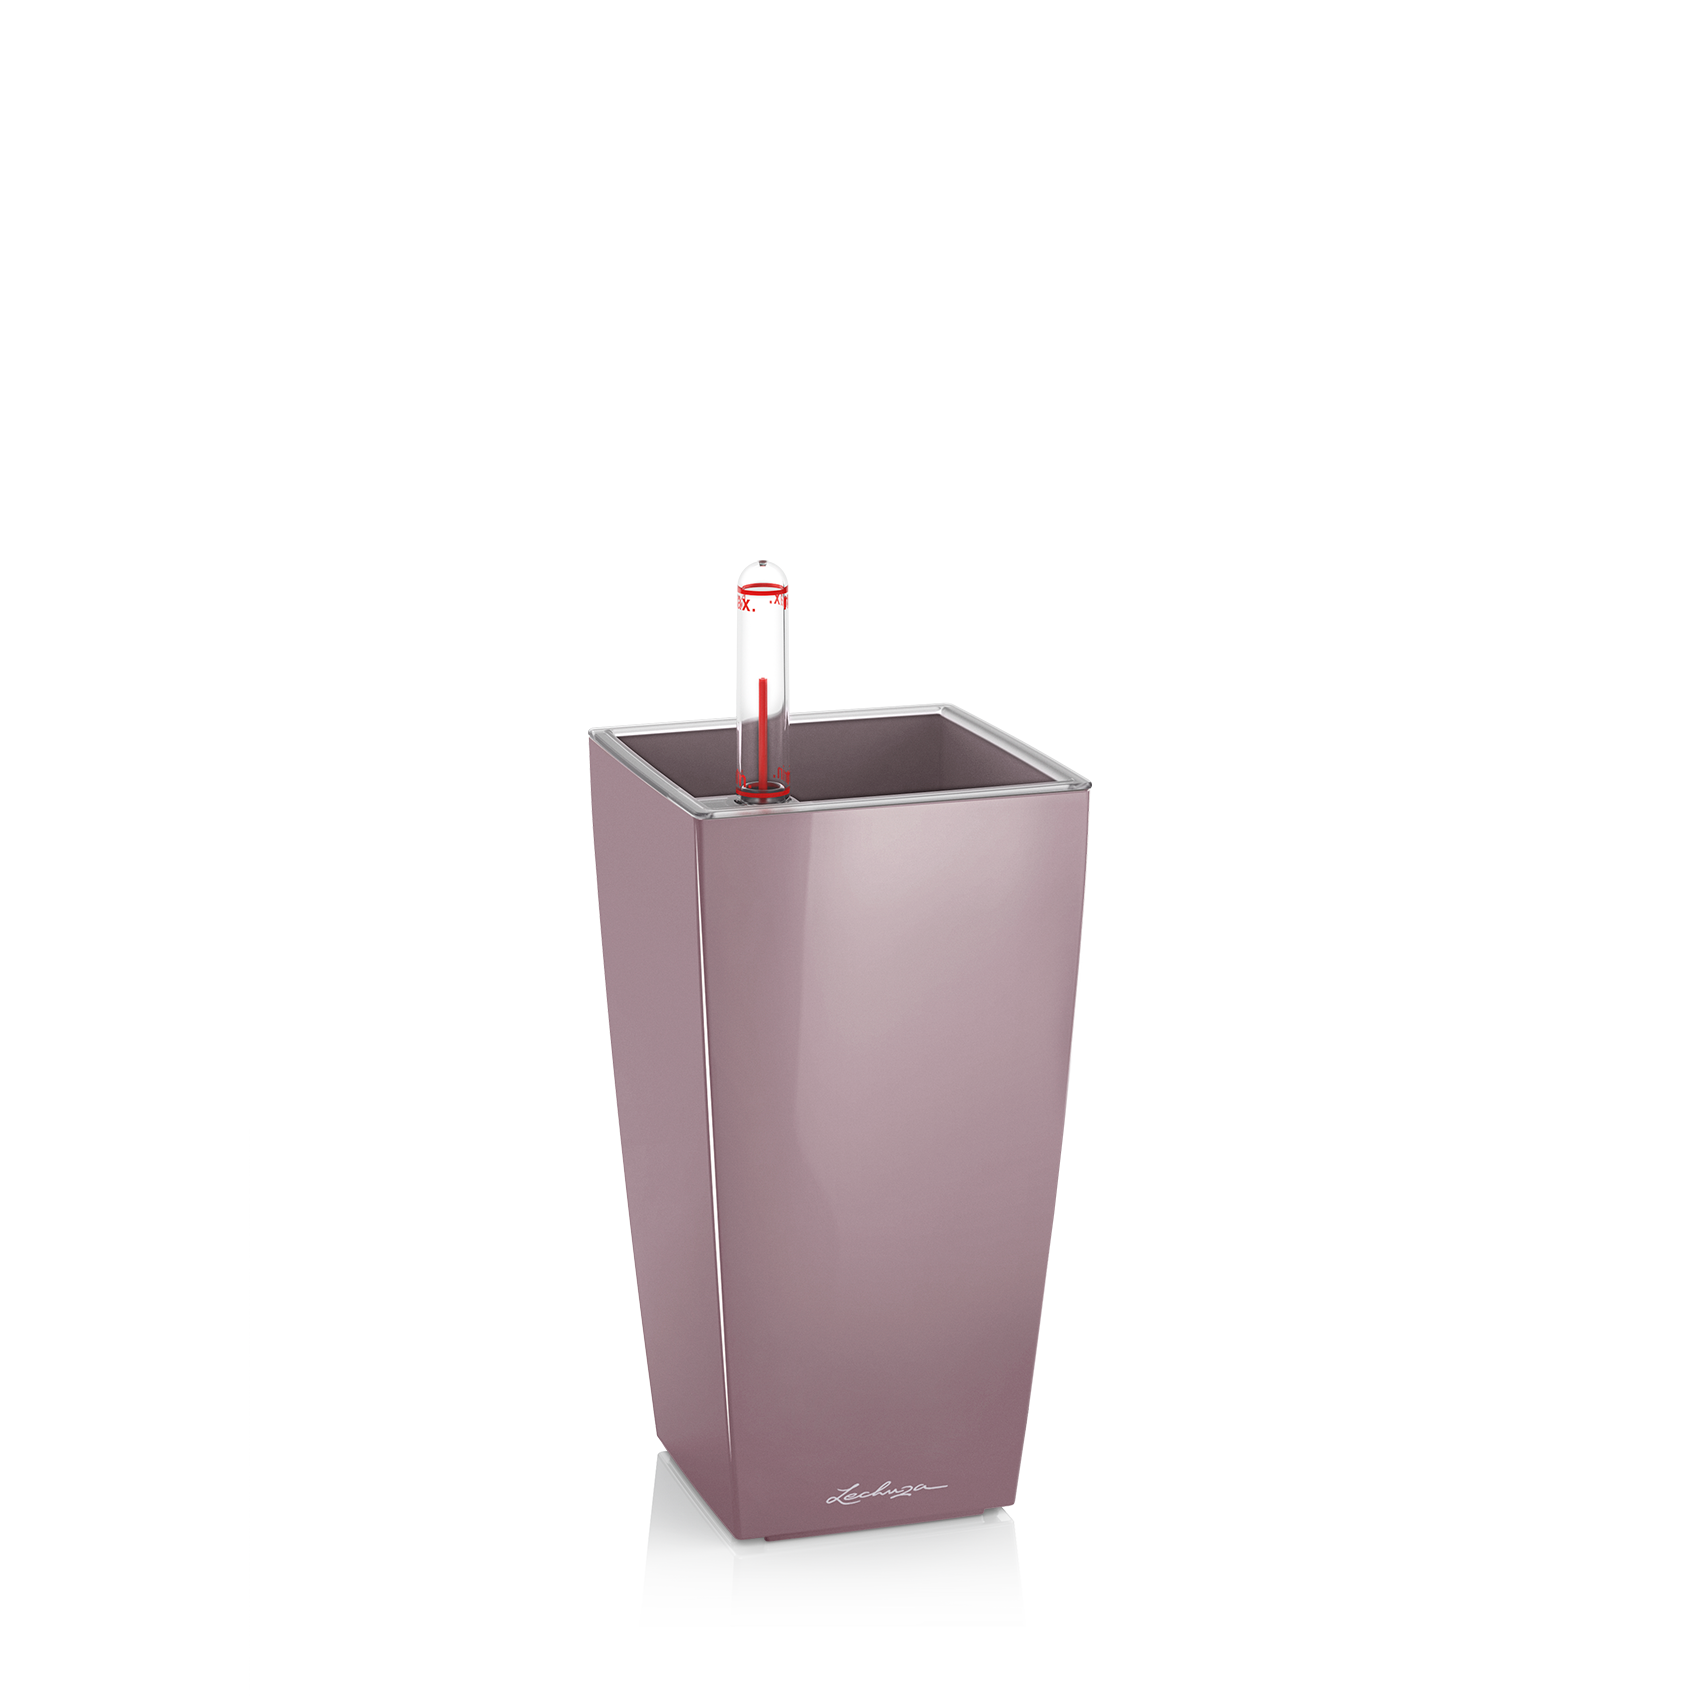 MINI-CUBI pastel violet high-gloss